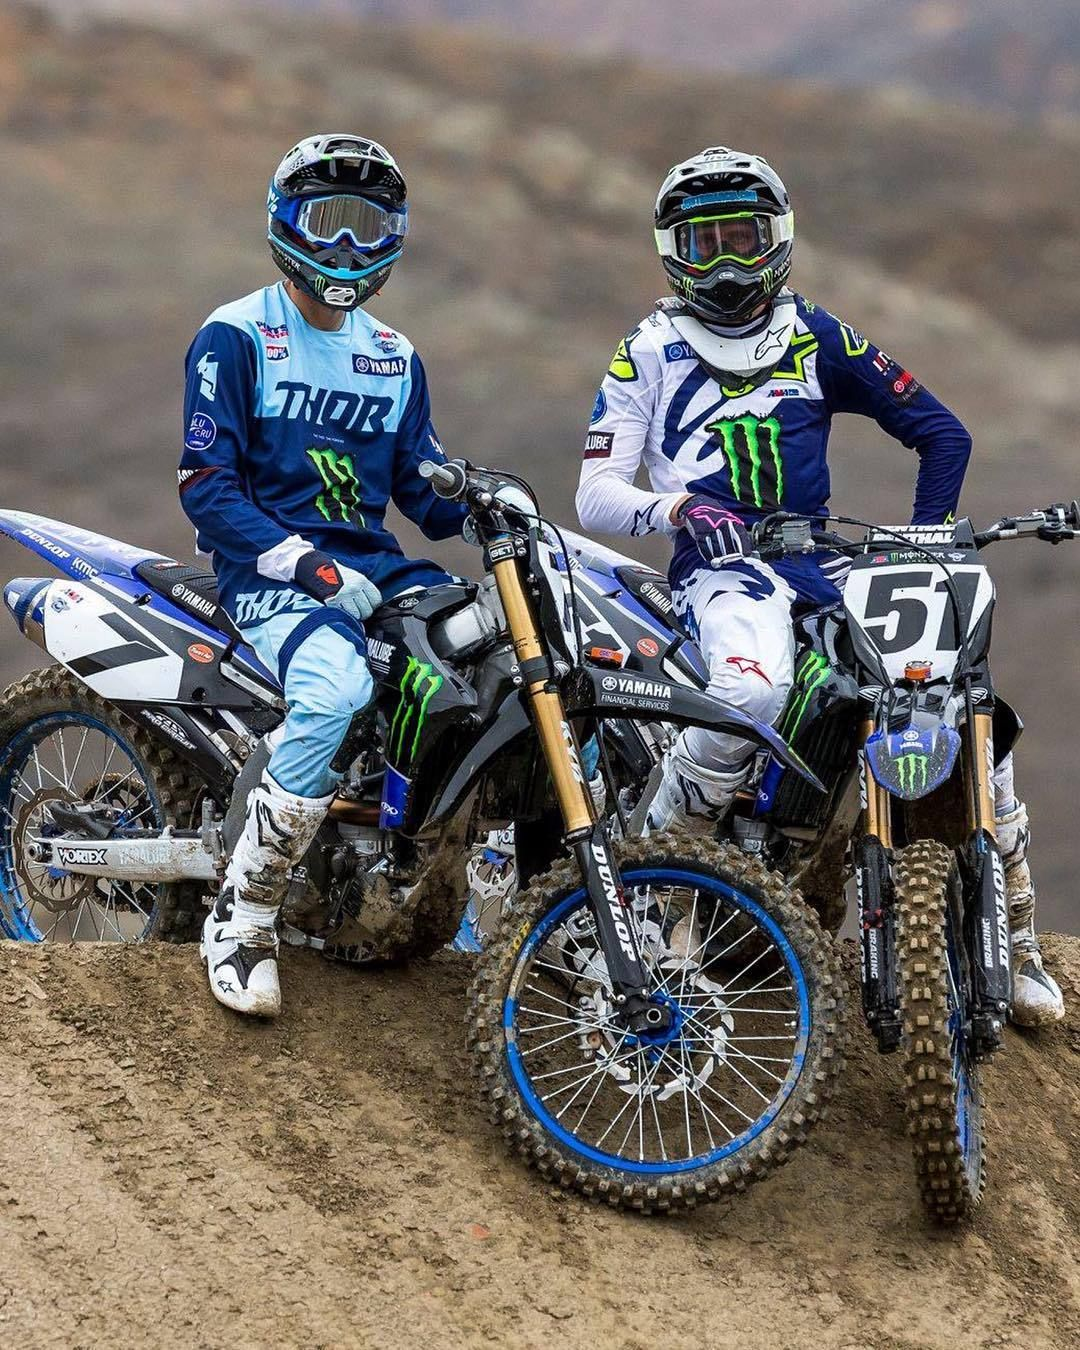 Monsterenergy Yamahamotorusa Factory Racing Team